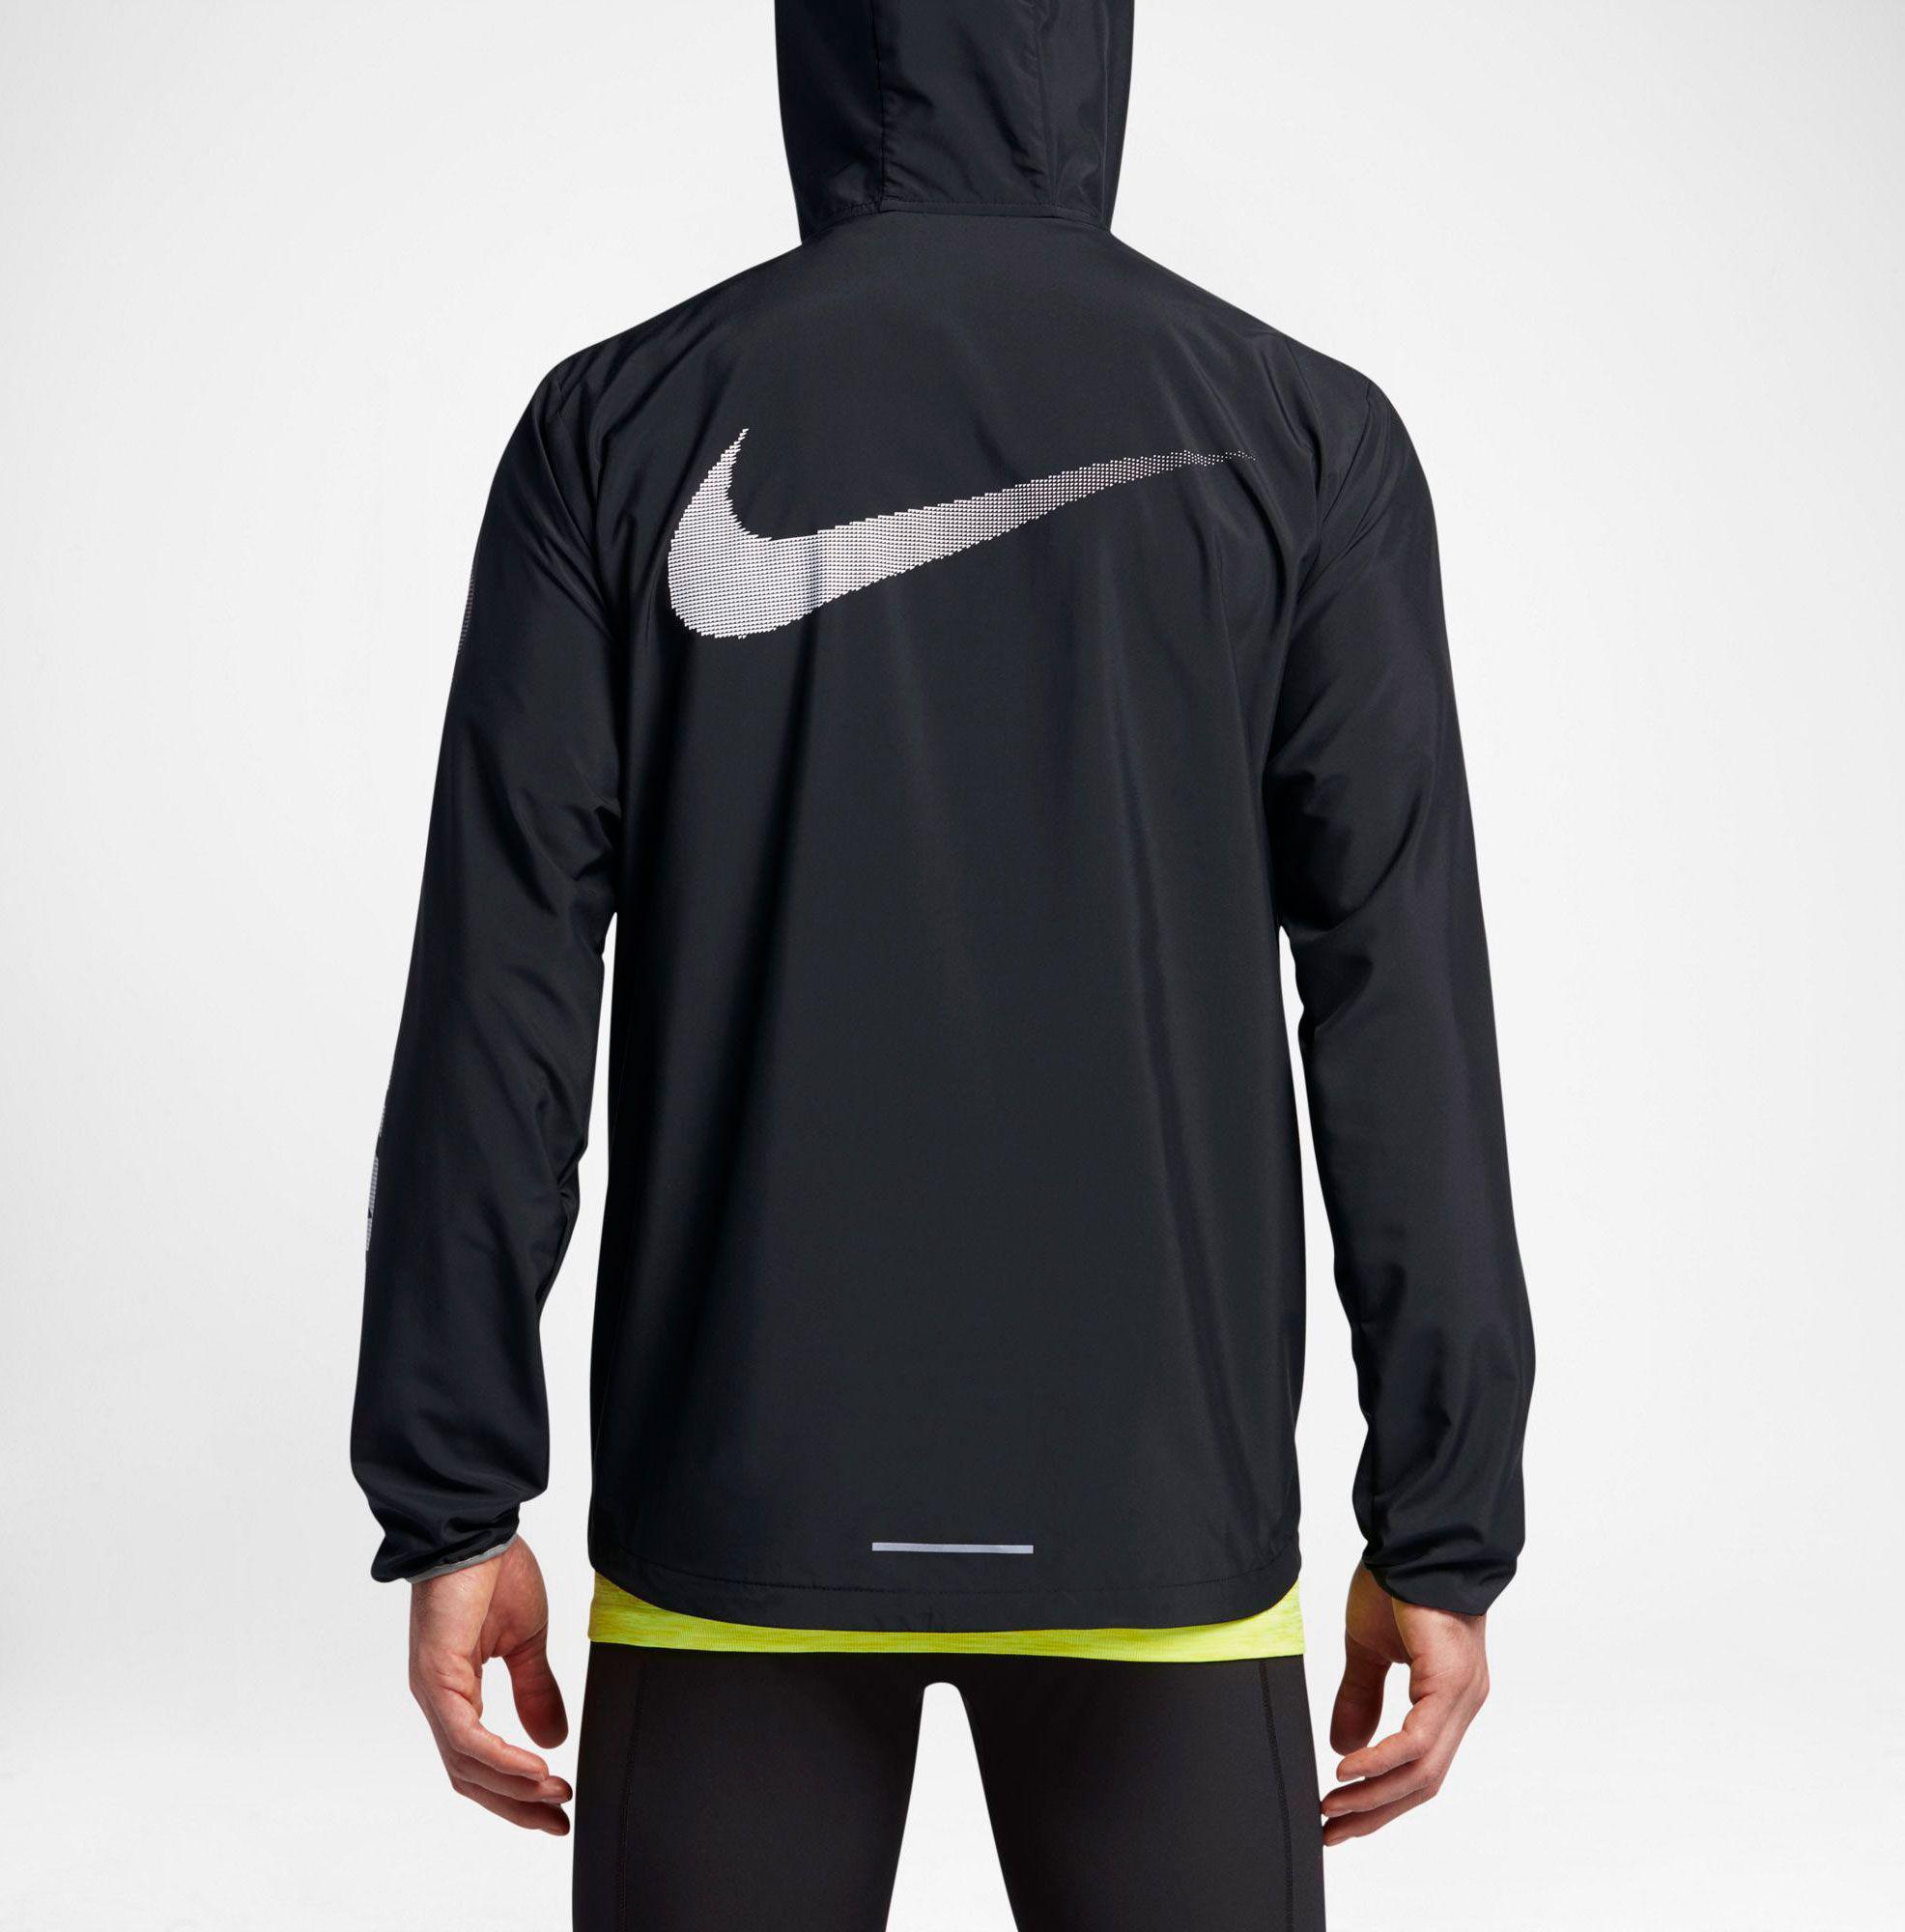 657997f30de72 Nike Black City Core Full Zip Running Jacket for men